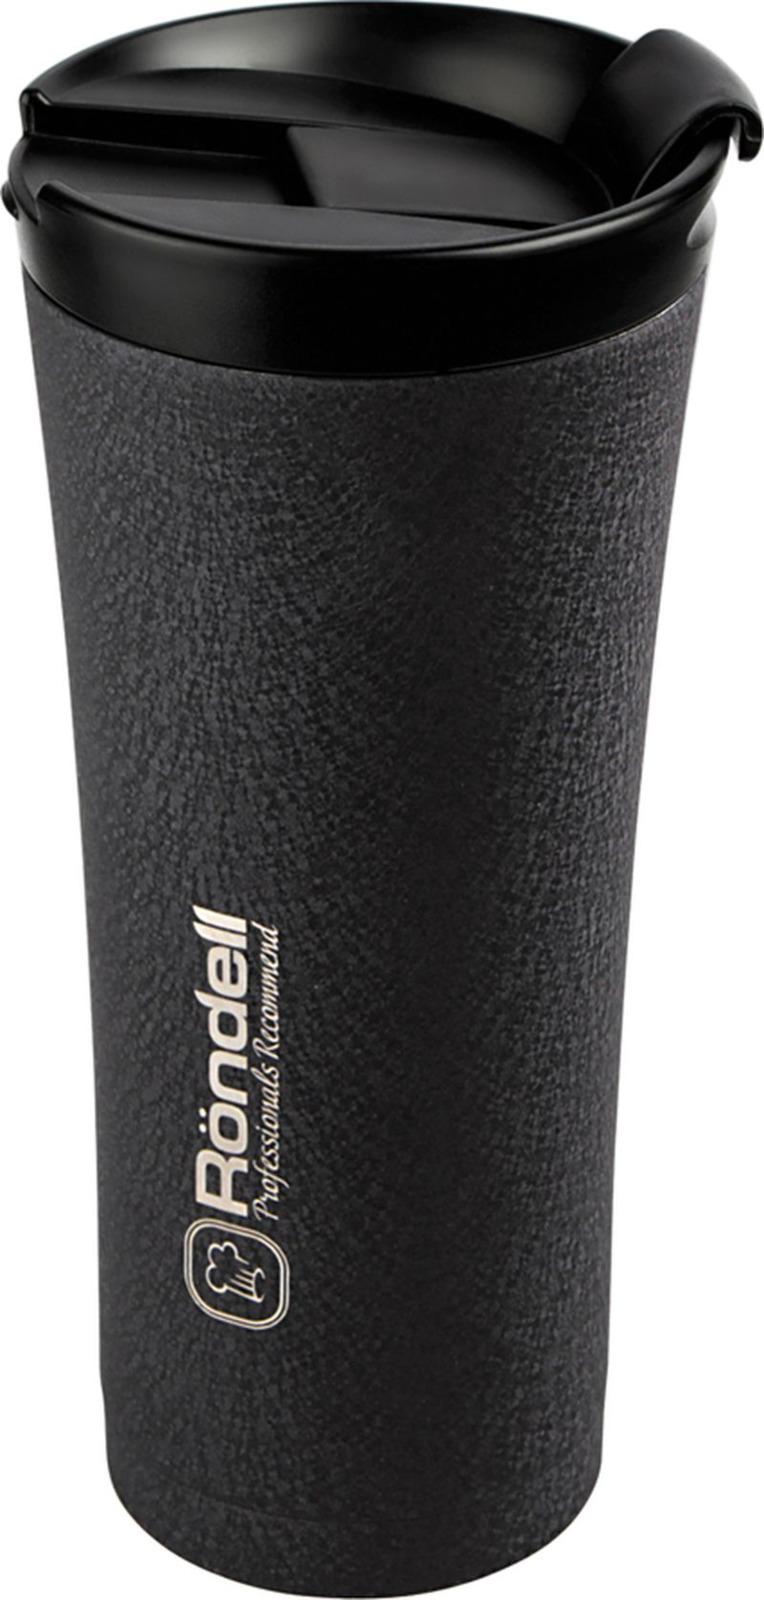 Термокружка Rondell Ultra Infinity, цвет: черный, 500 мл